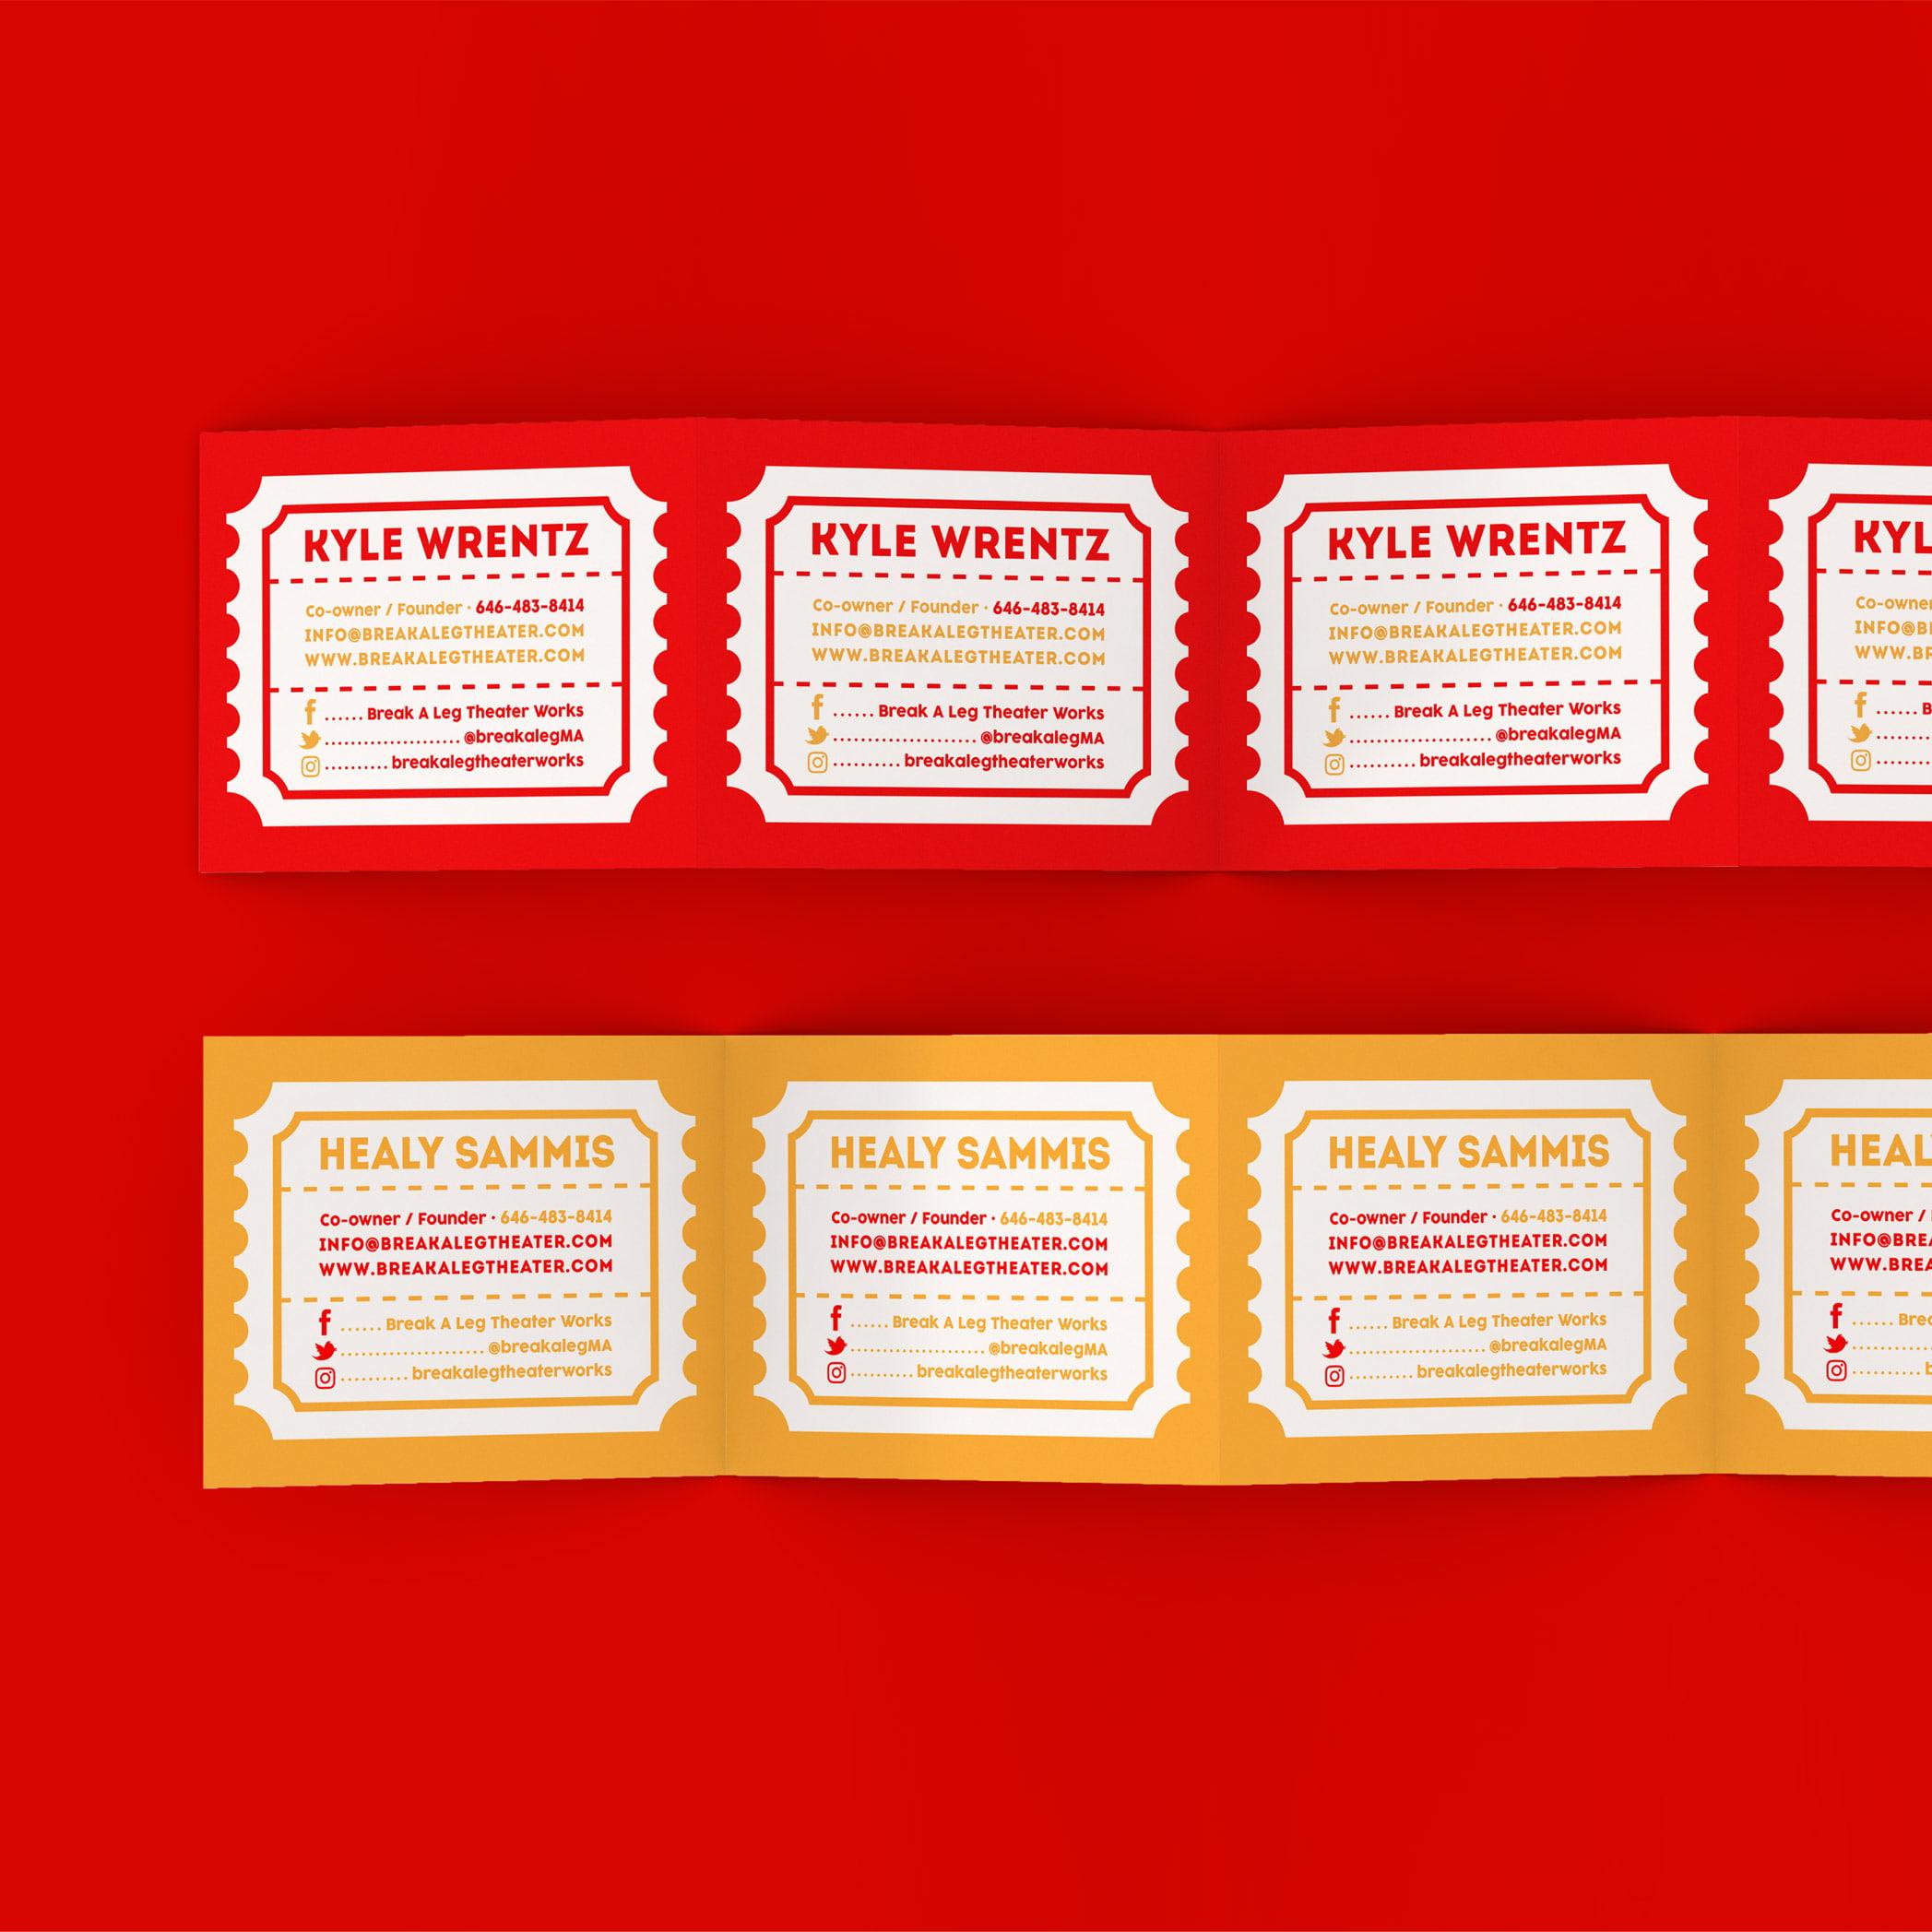 Riser Creates Identity Design For Break a Leg Theater Works